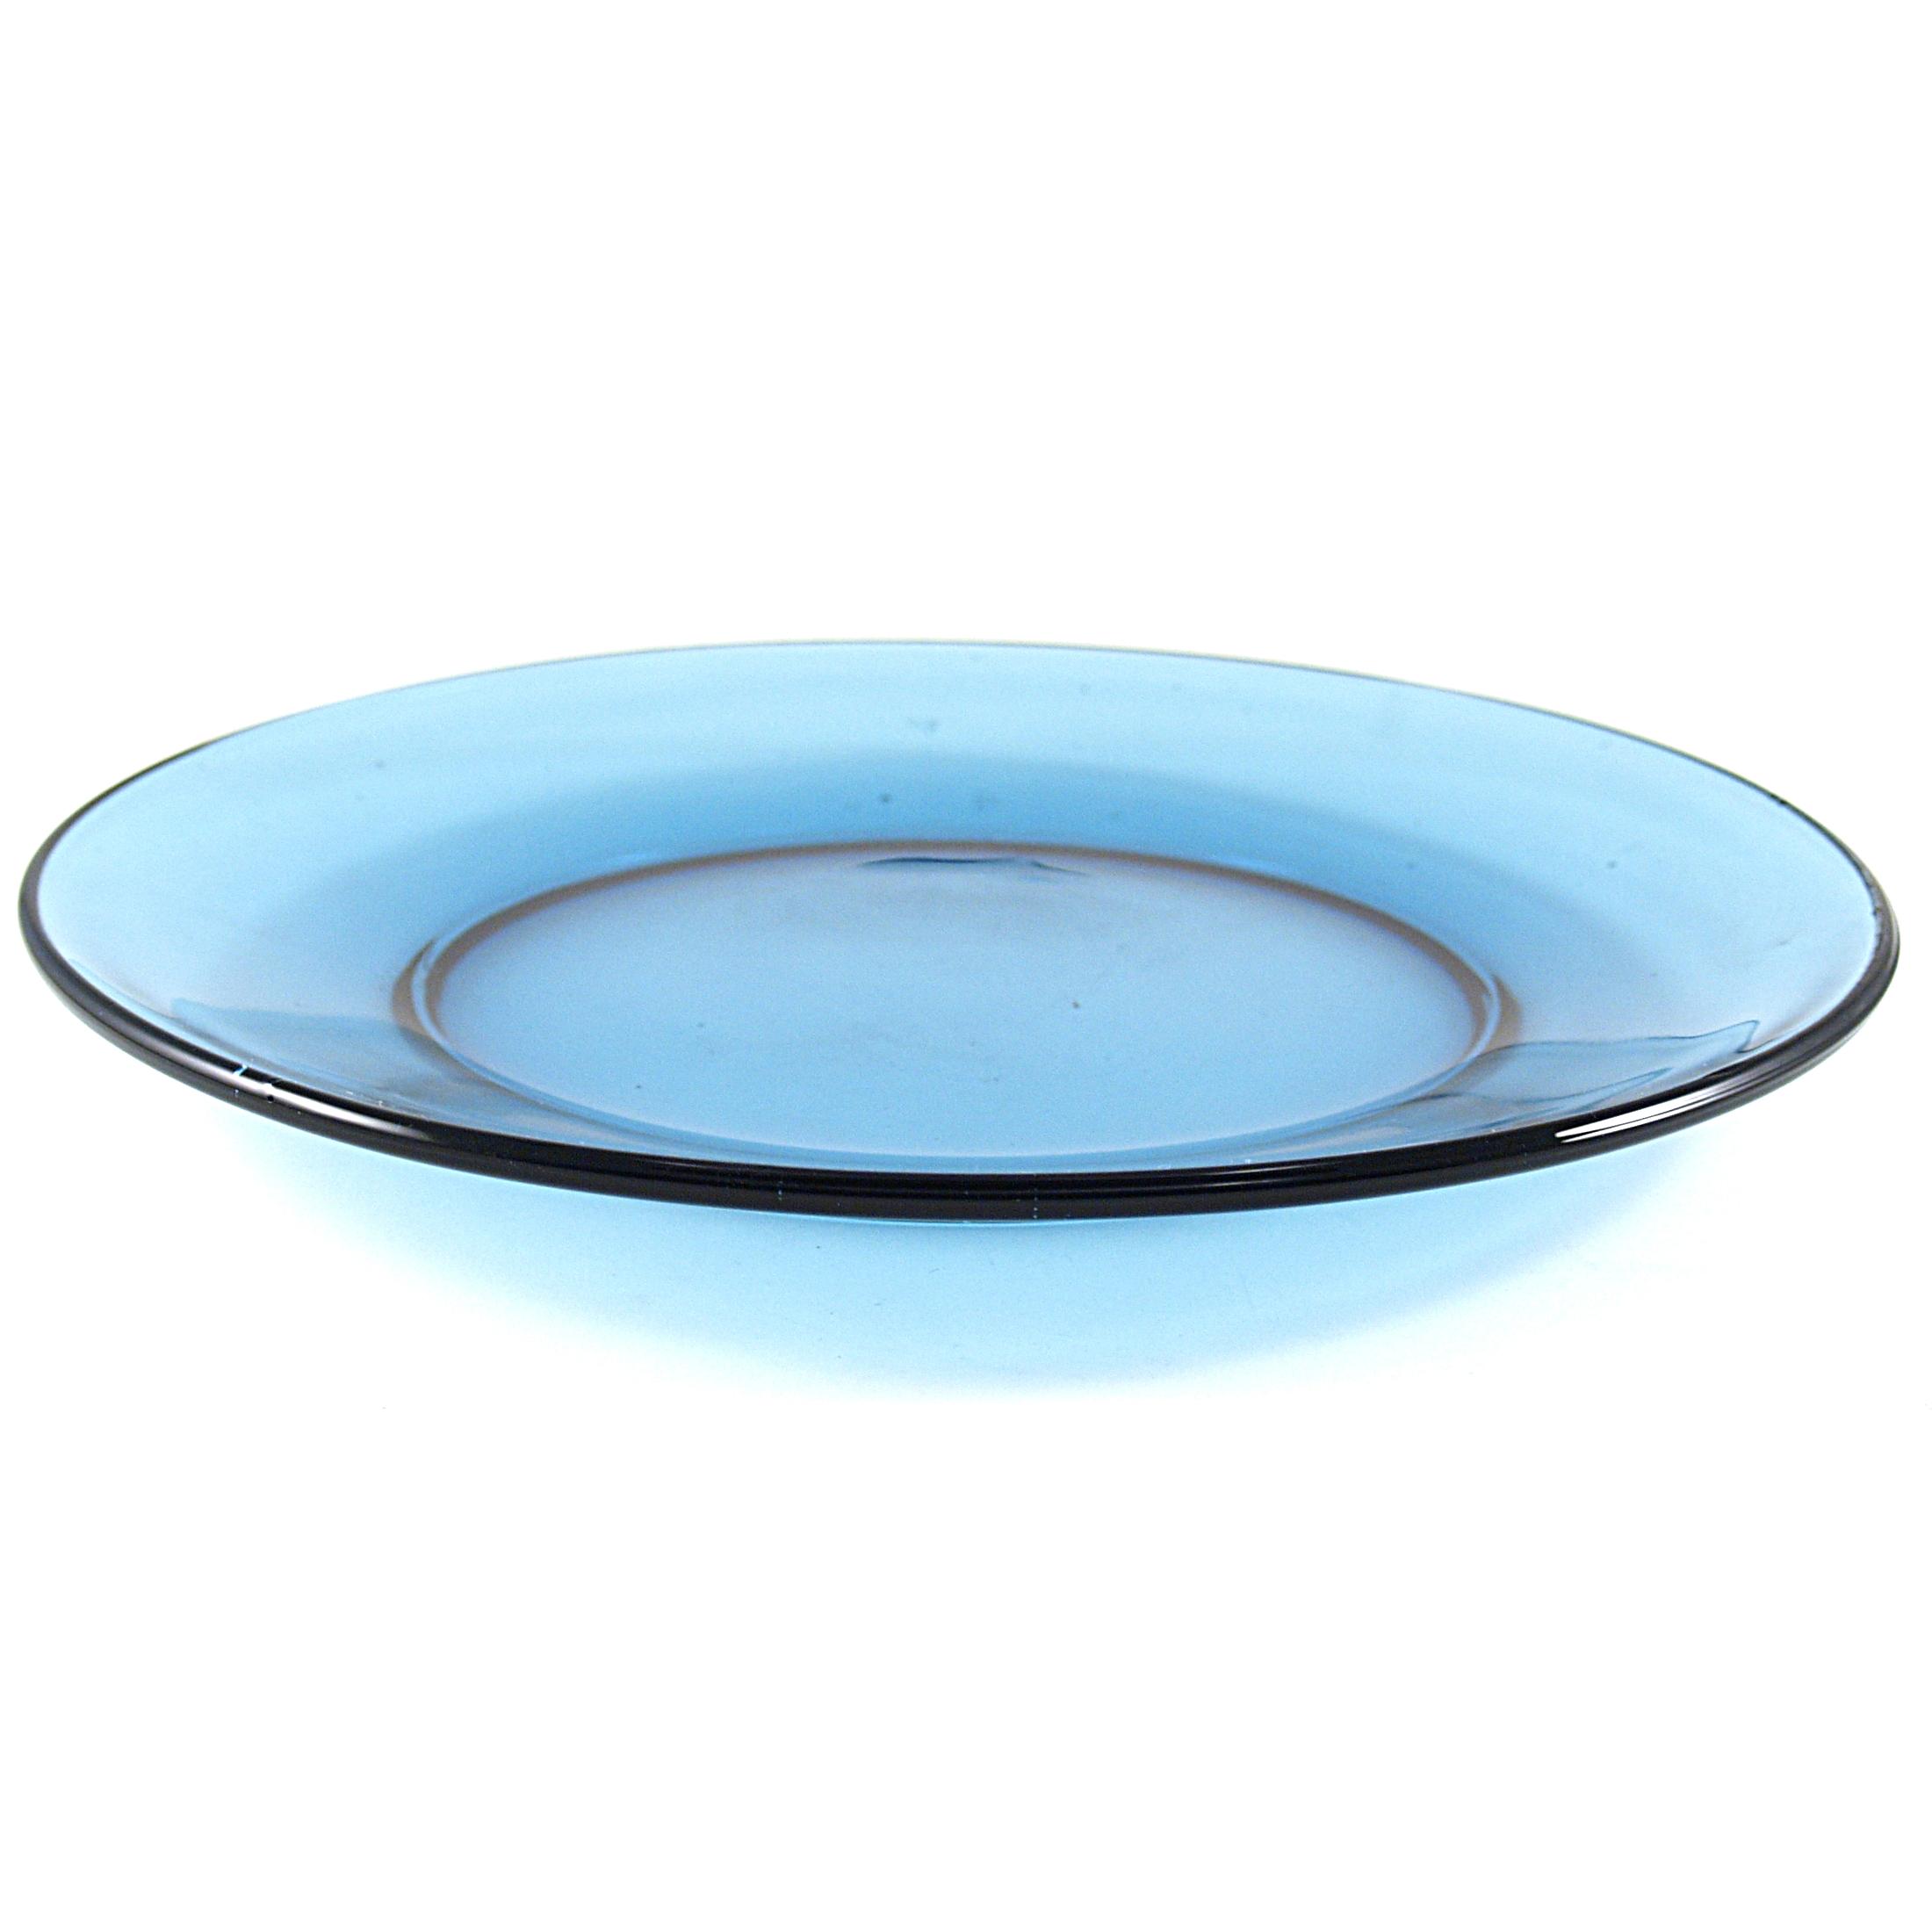 Mainstays Presence Denim Blue Glass 10 Inch Dinner Plate